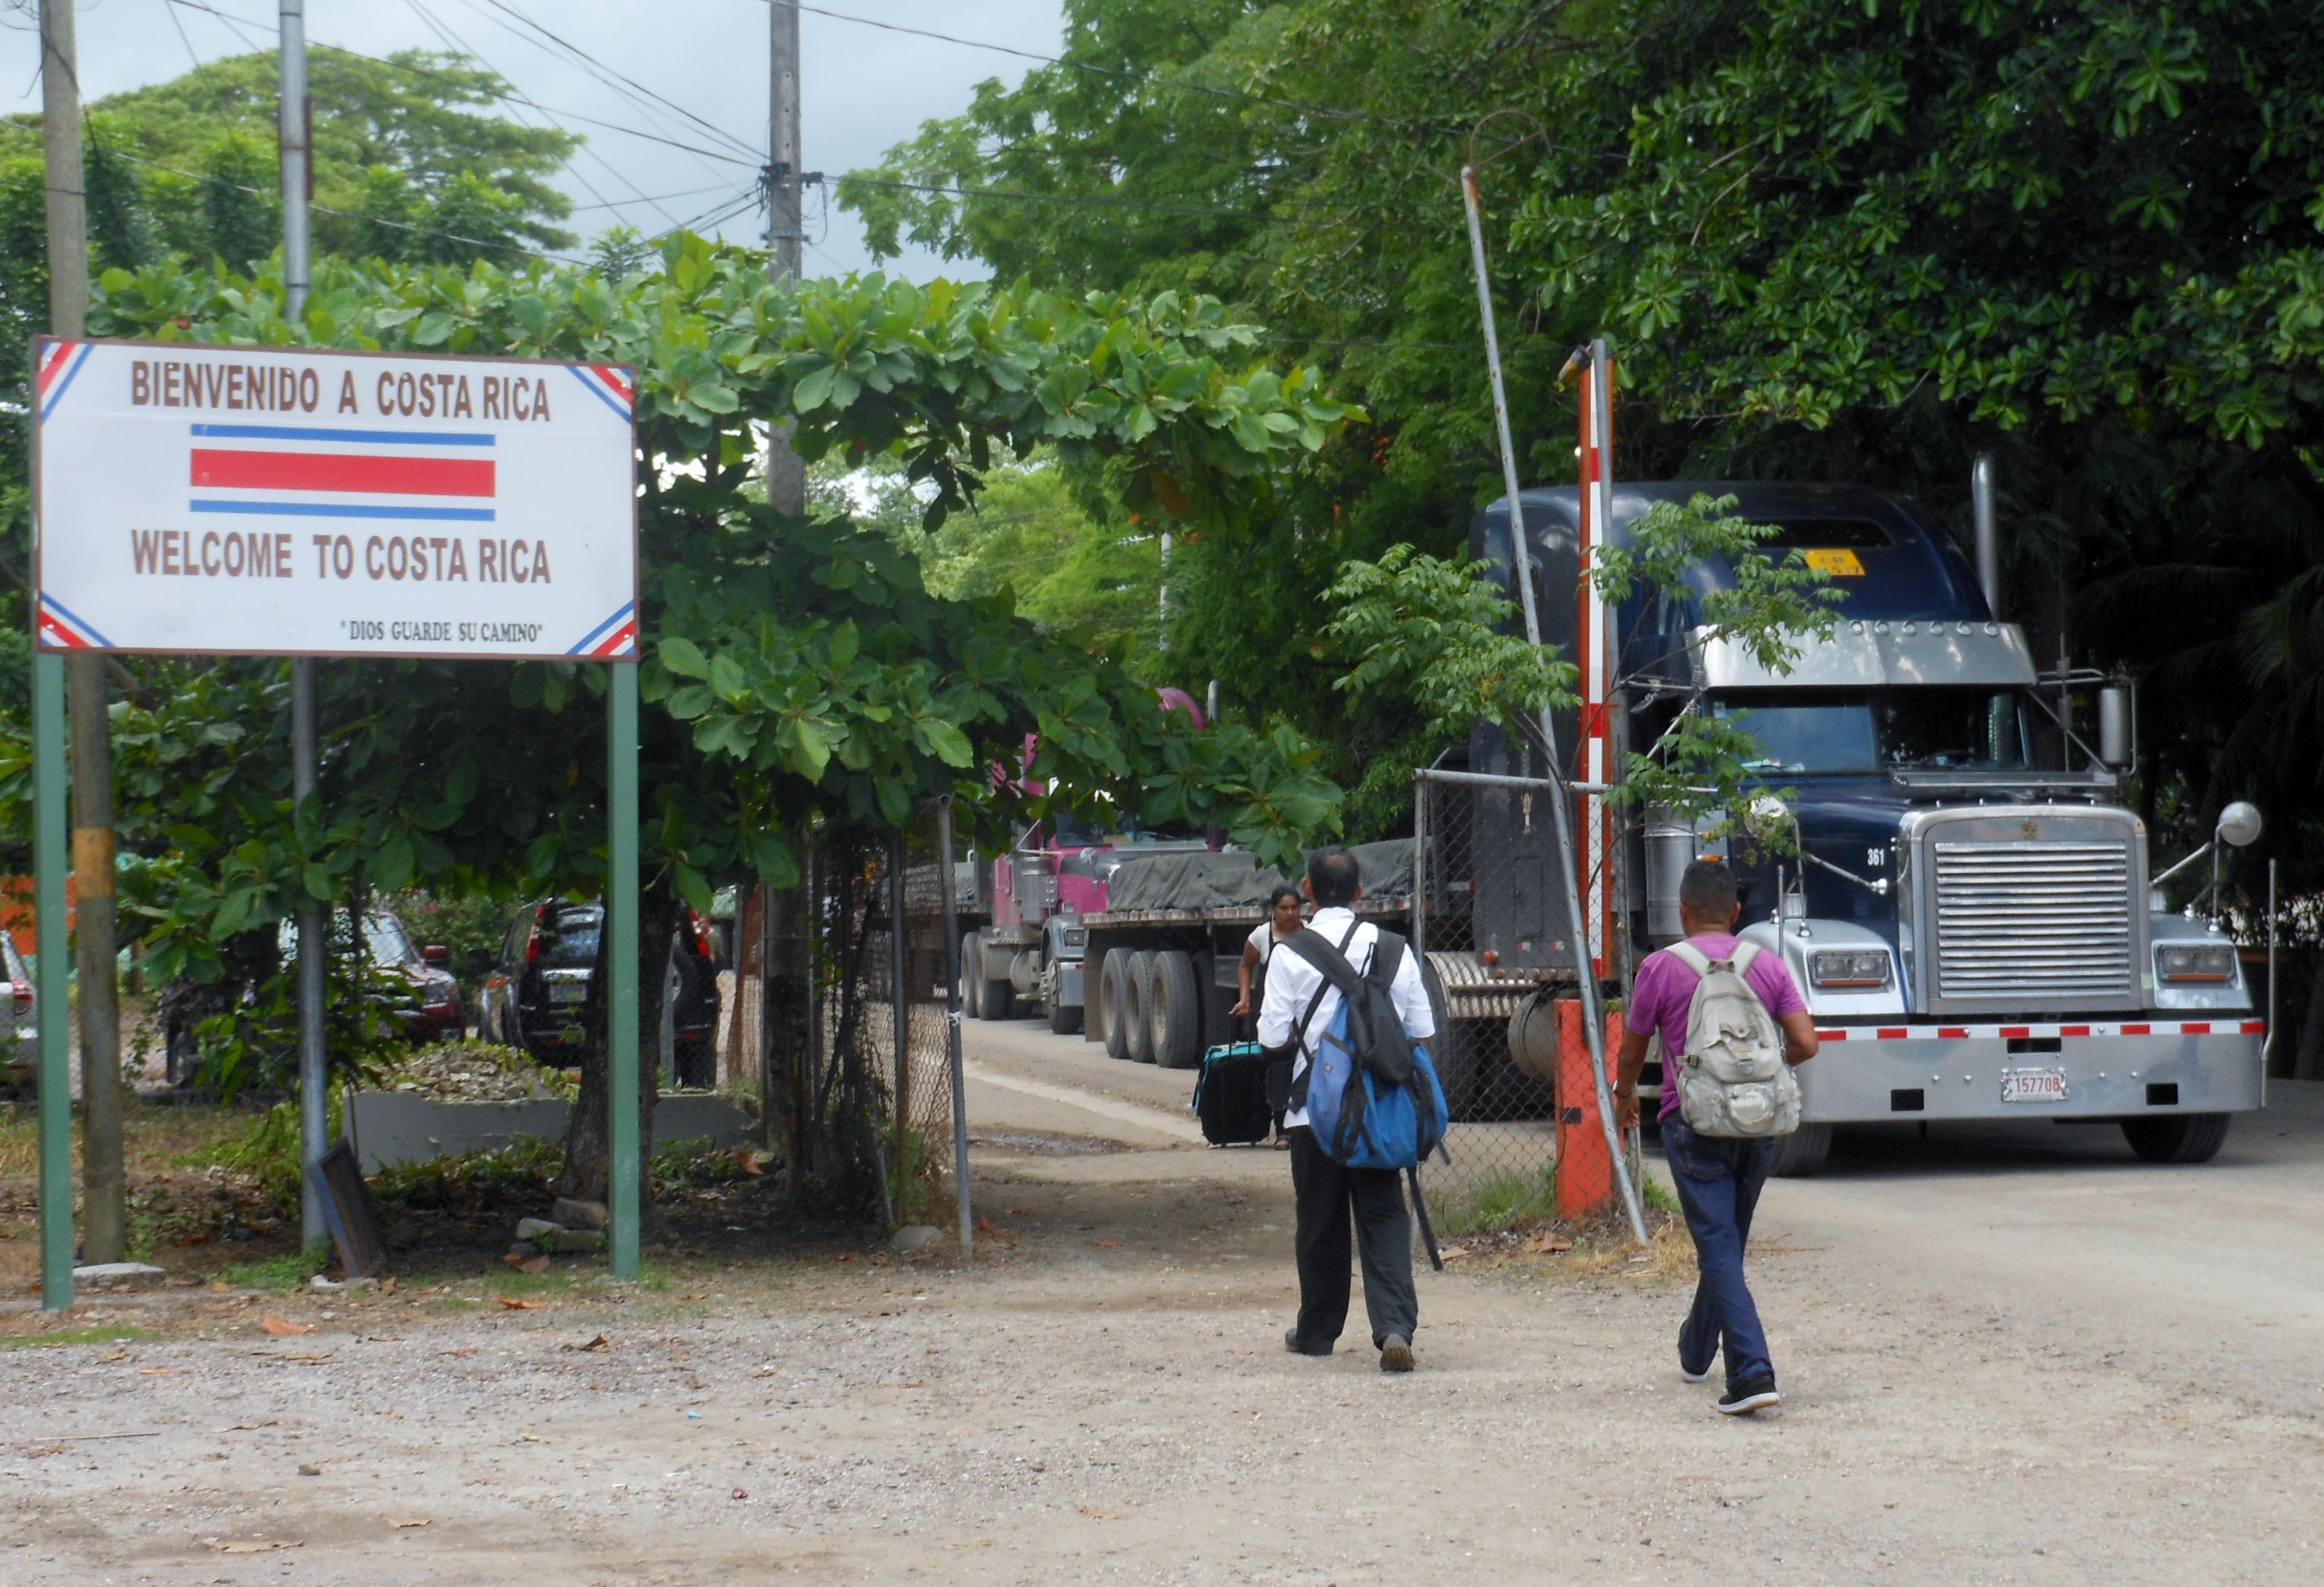 Entering Costa Rica